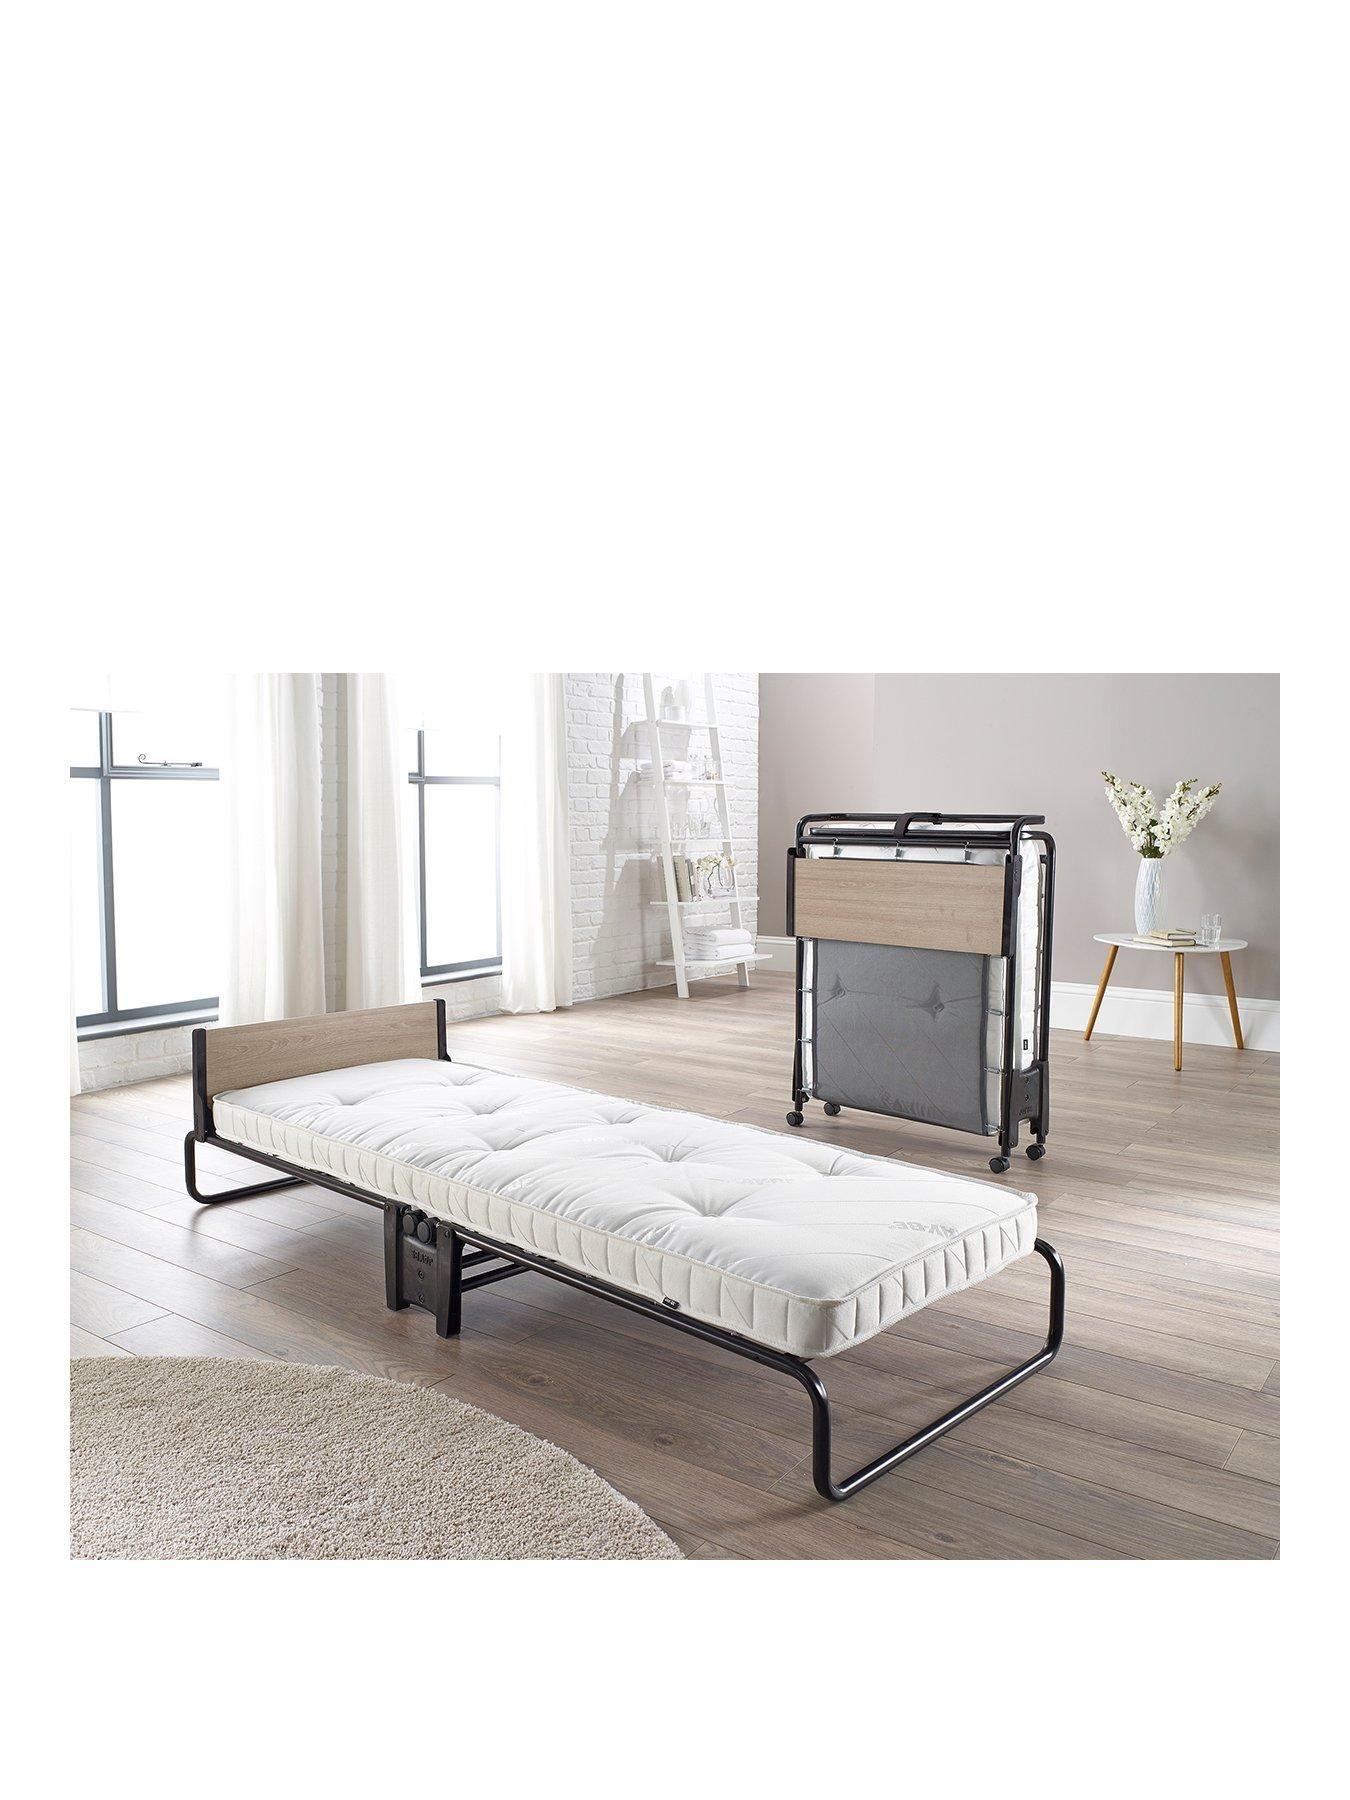 Jaybe Revolution Folding Single Bed With Pocket Sprung Mattress